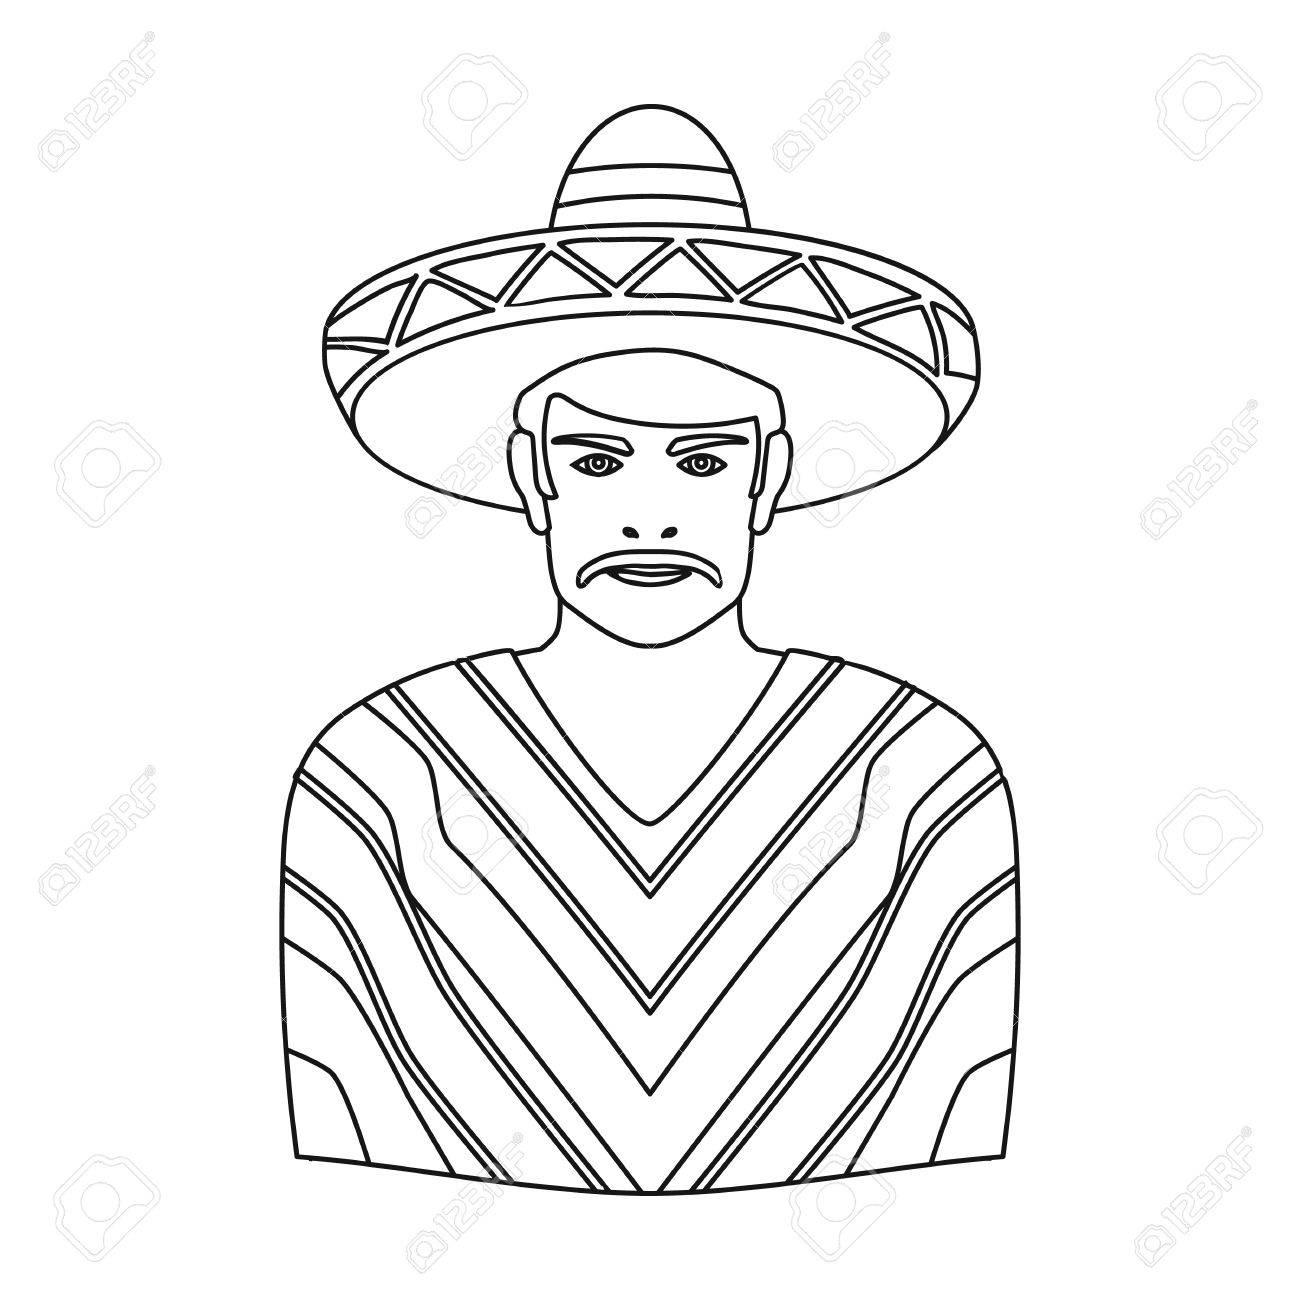 Sombrero Drawing At Getdrawings